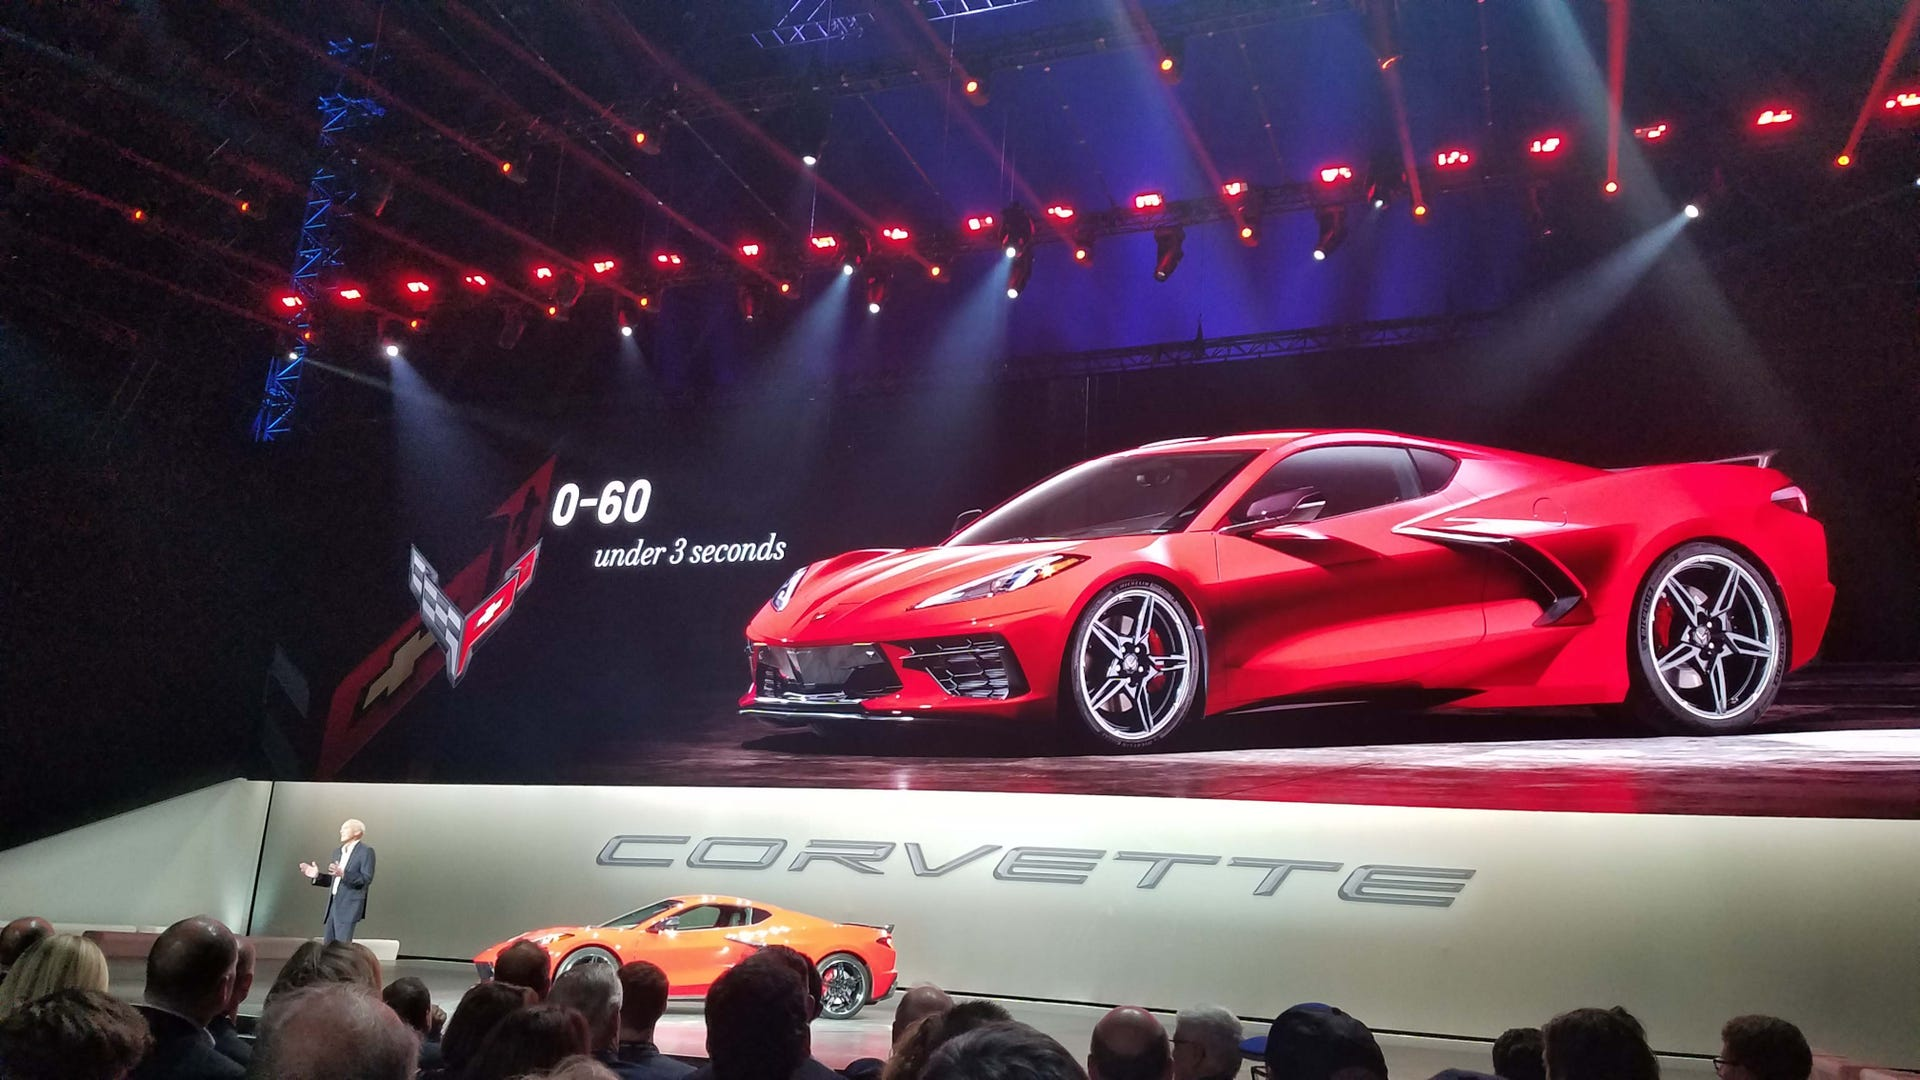 The 2020 Mid Engine Corvette C8